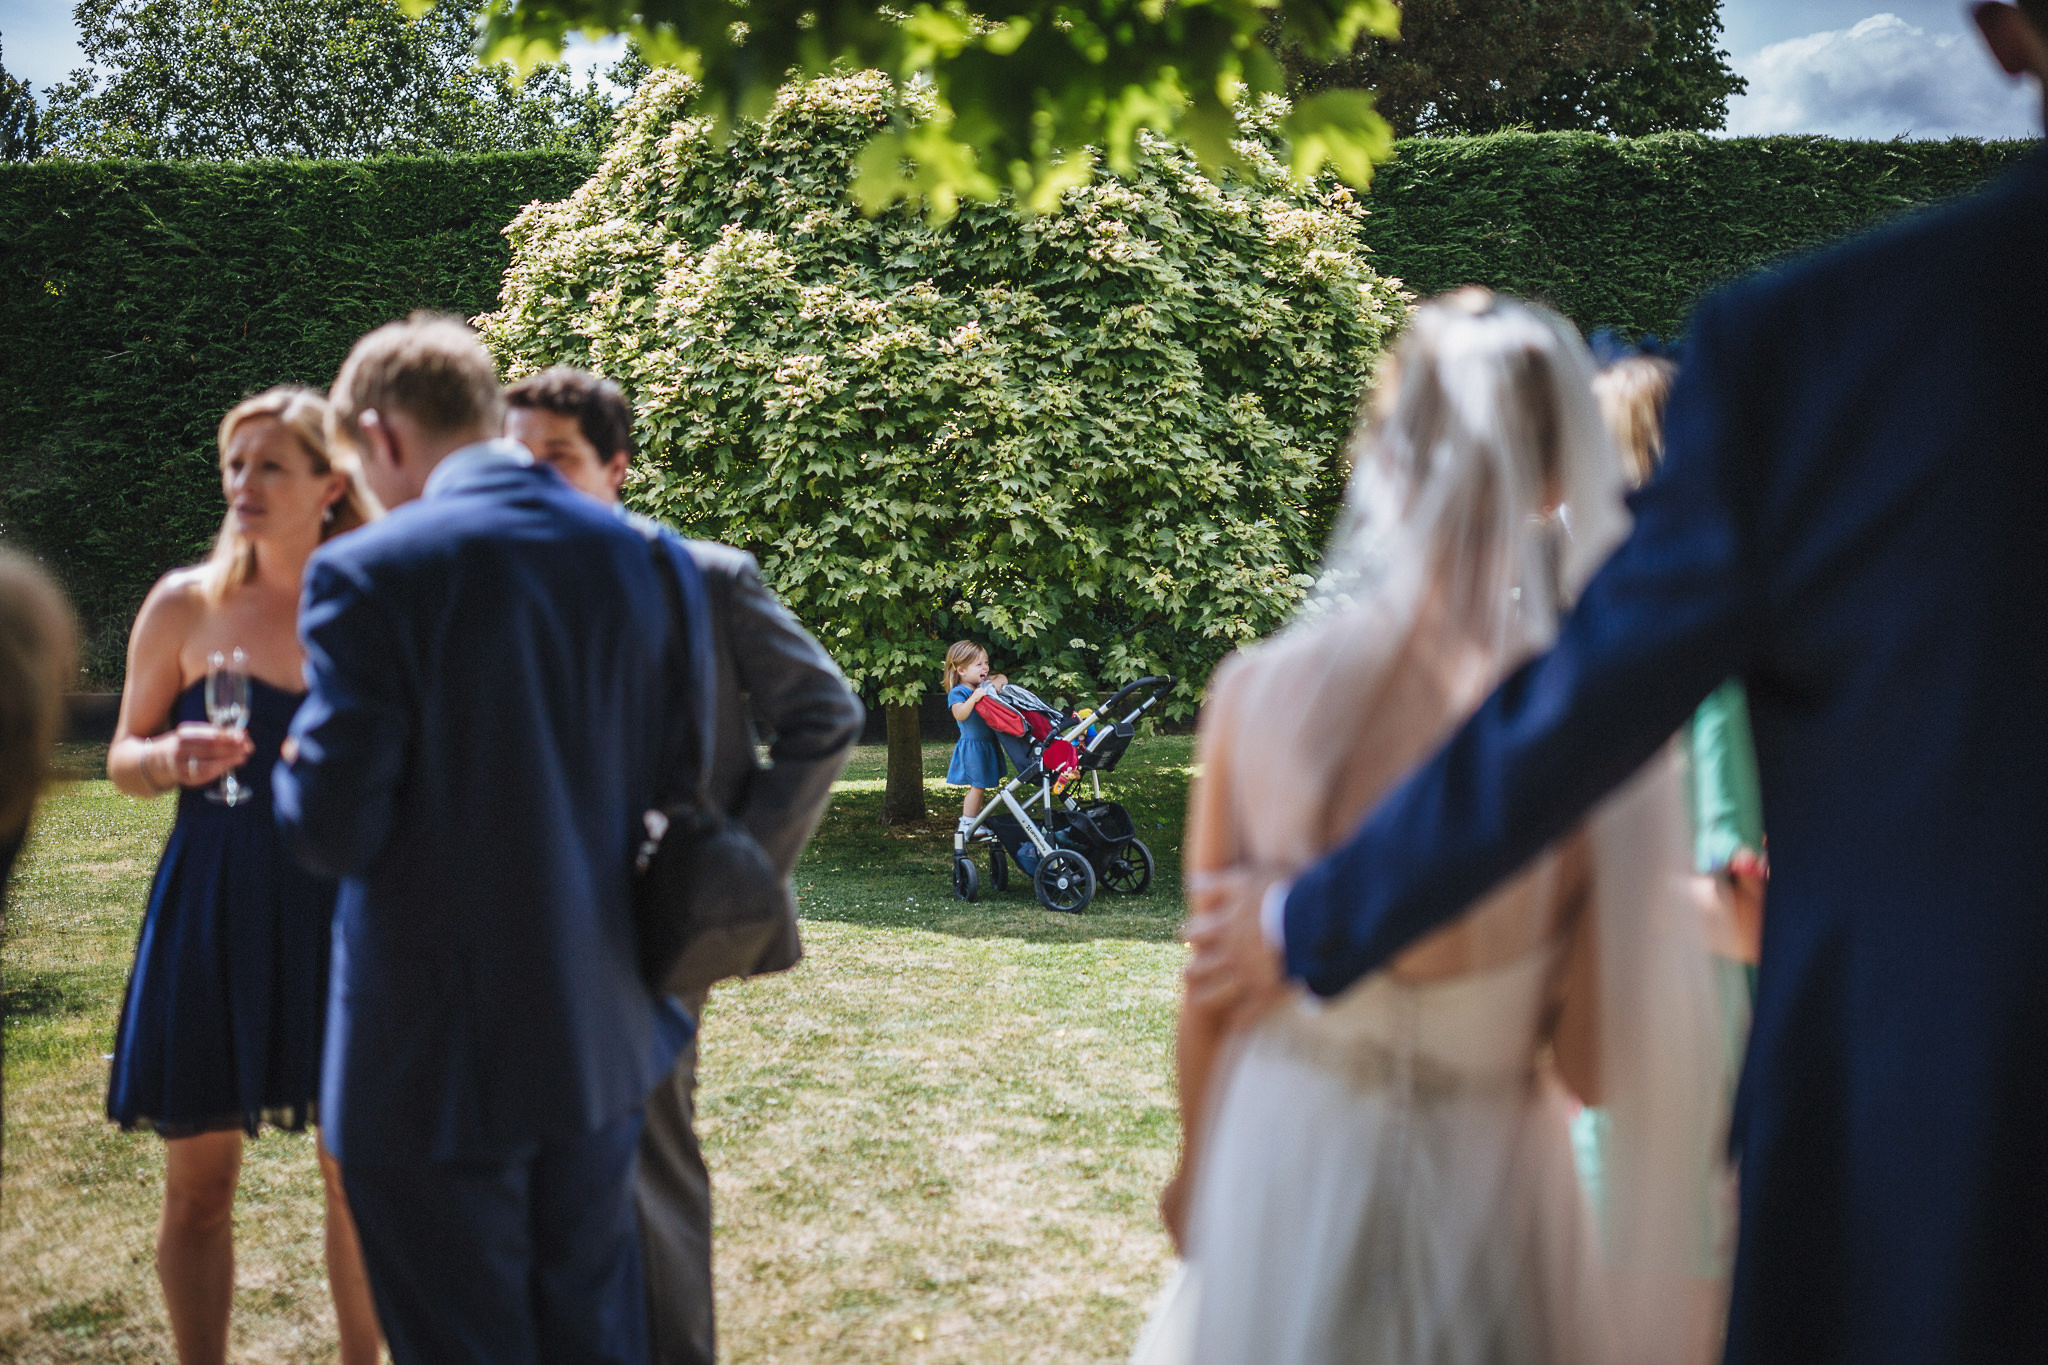 paul-marbrook-Gaynes-Park Wedding-Photographer-90072